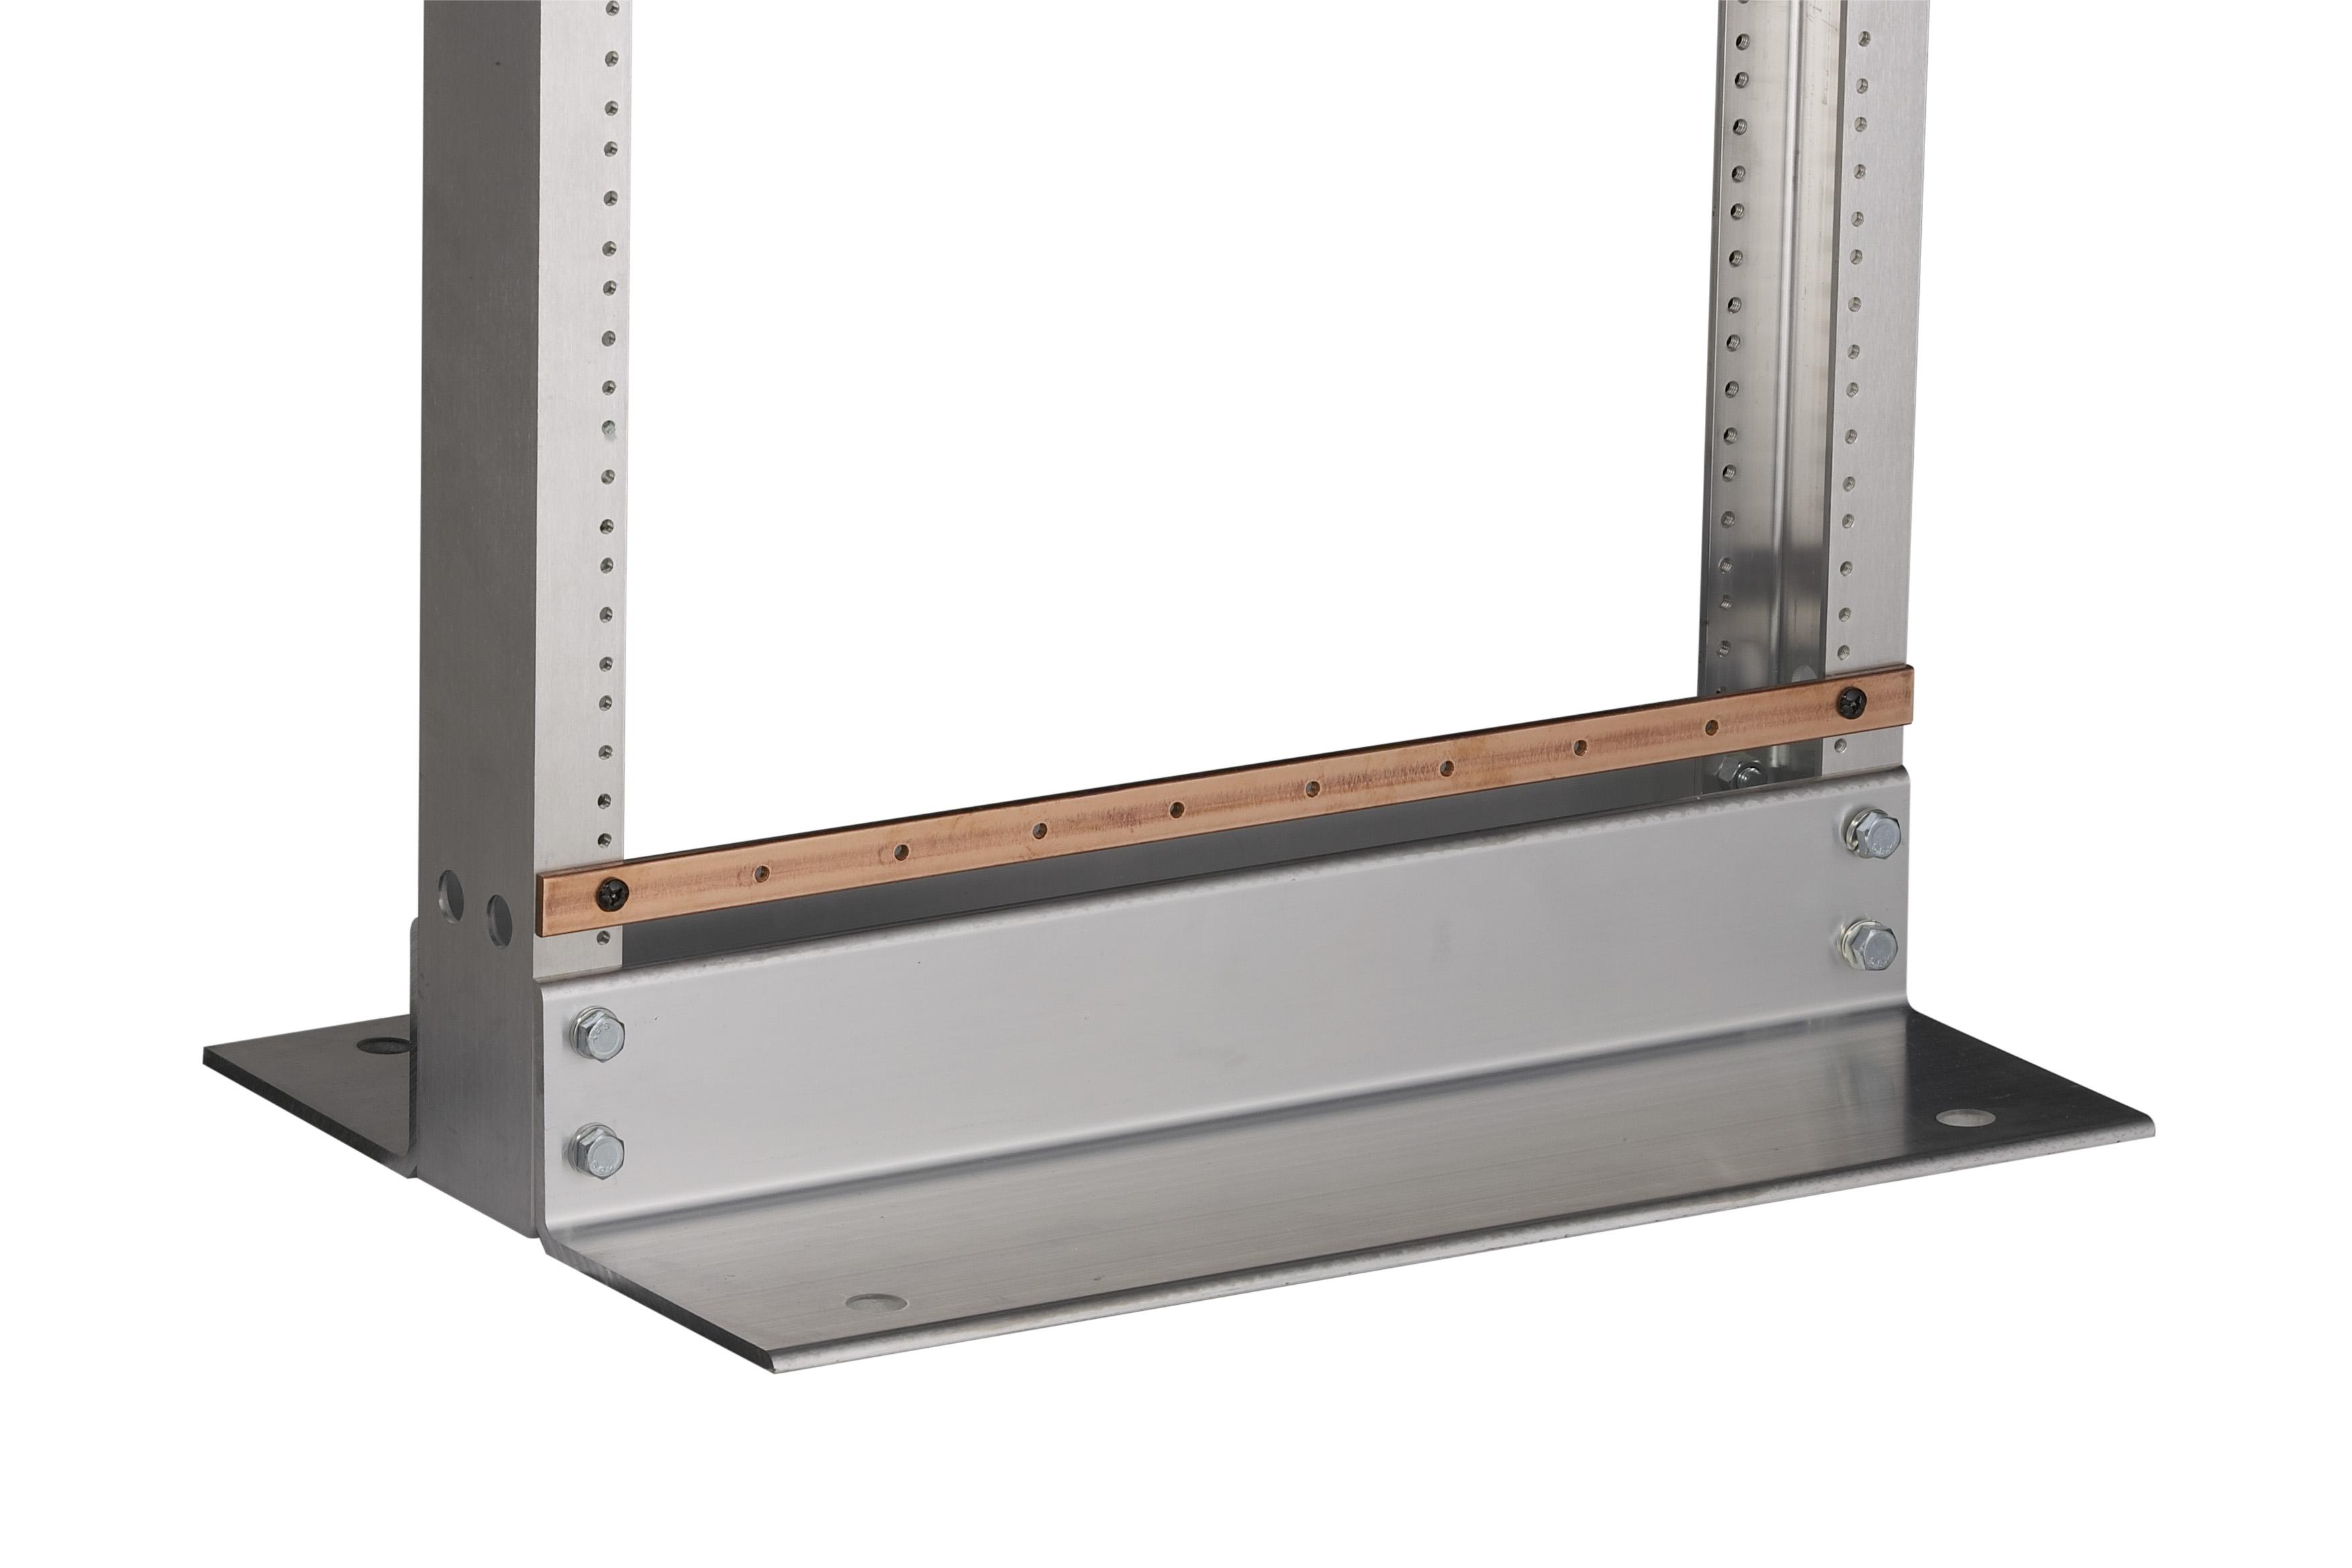 Grounding Bar For 19 Rack 02H X 075W 202L I Black Box